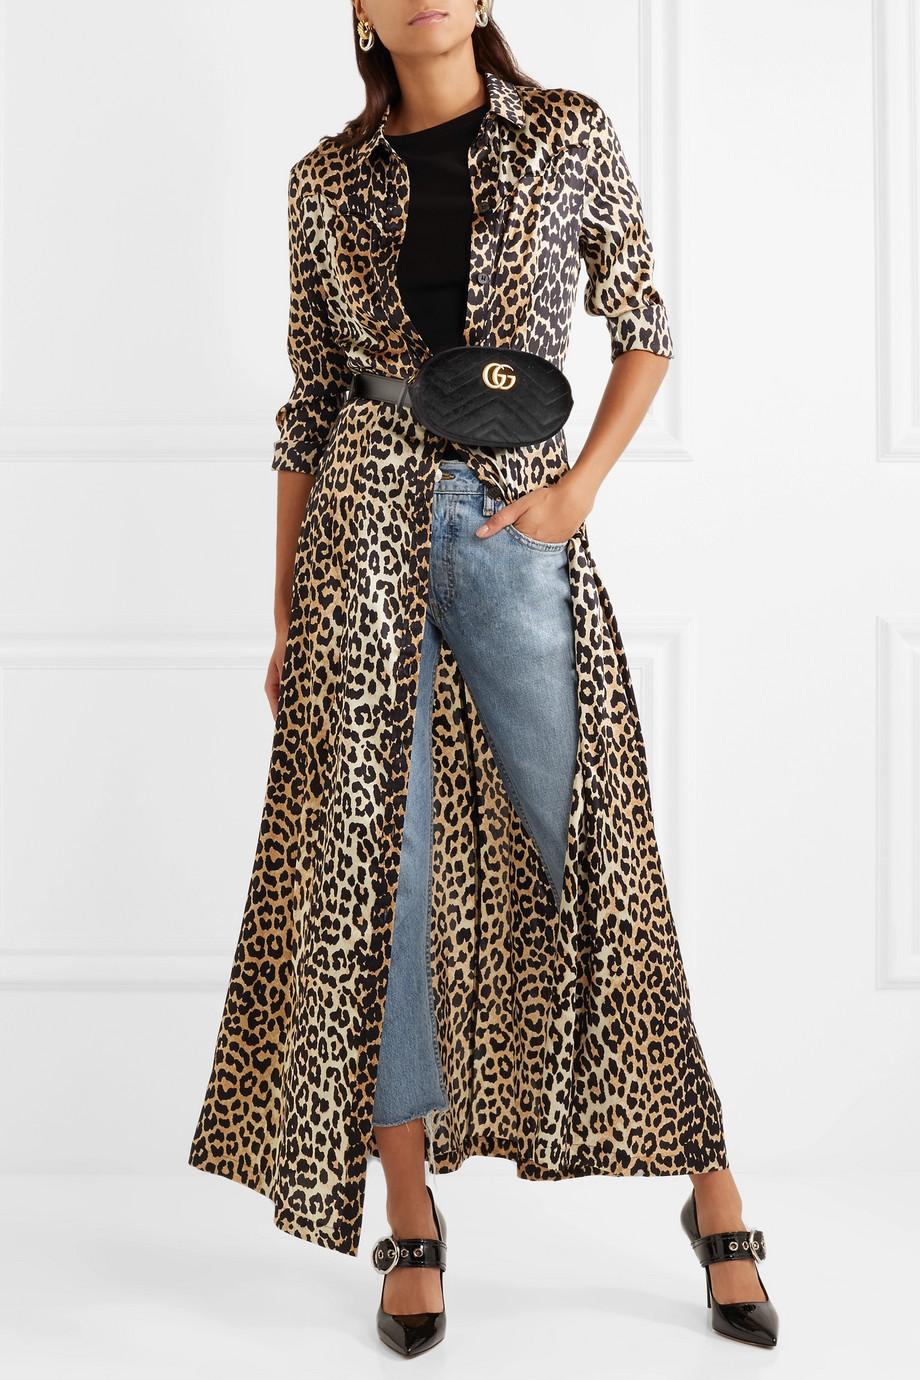 blue-light-crop-jeans-black-tee-tan-dress-shirt-leopard-print-black-bag-fannypack-hairr-earrings-black-shoe-pumps-fall-winter-lunch.jpg